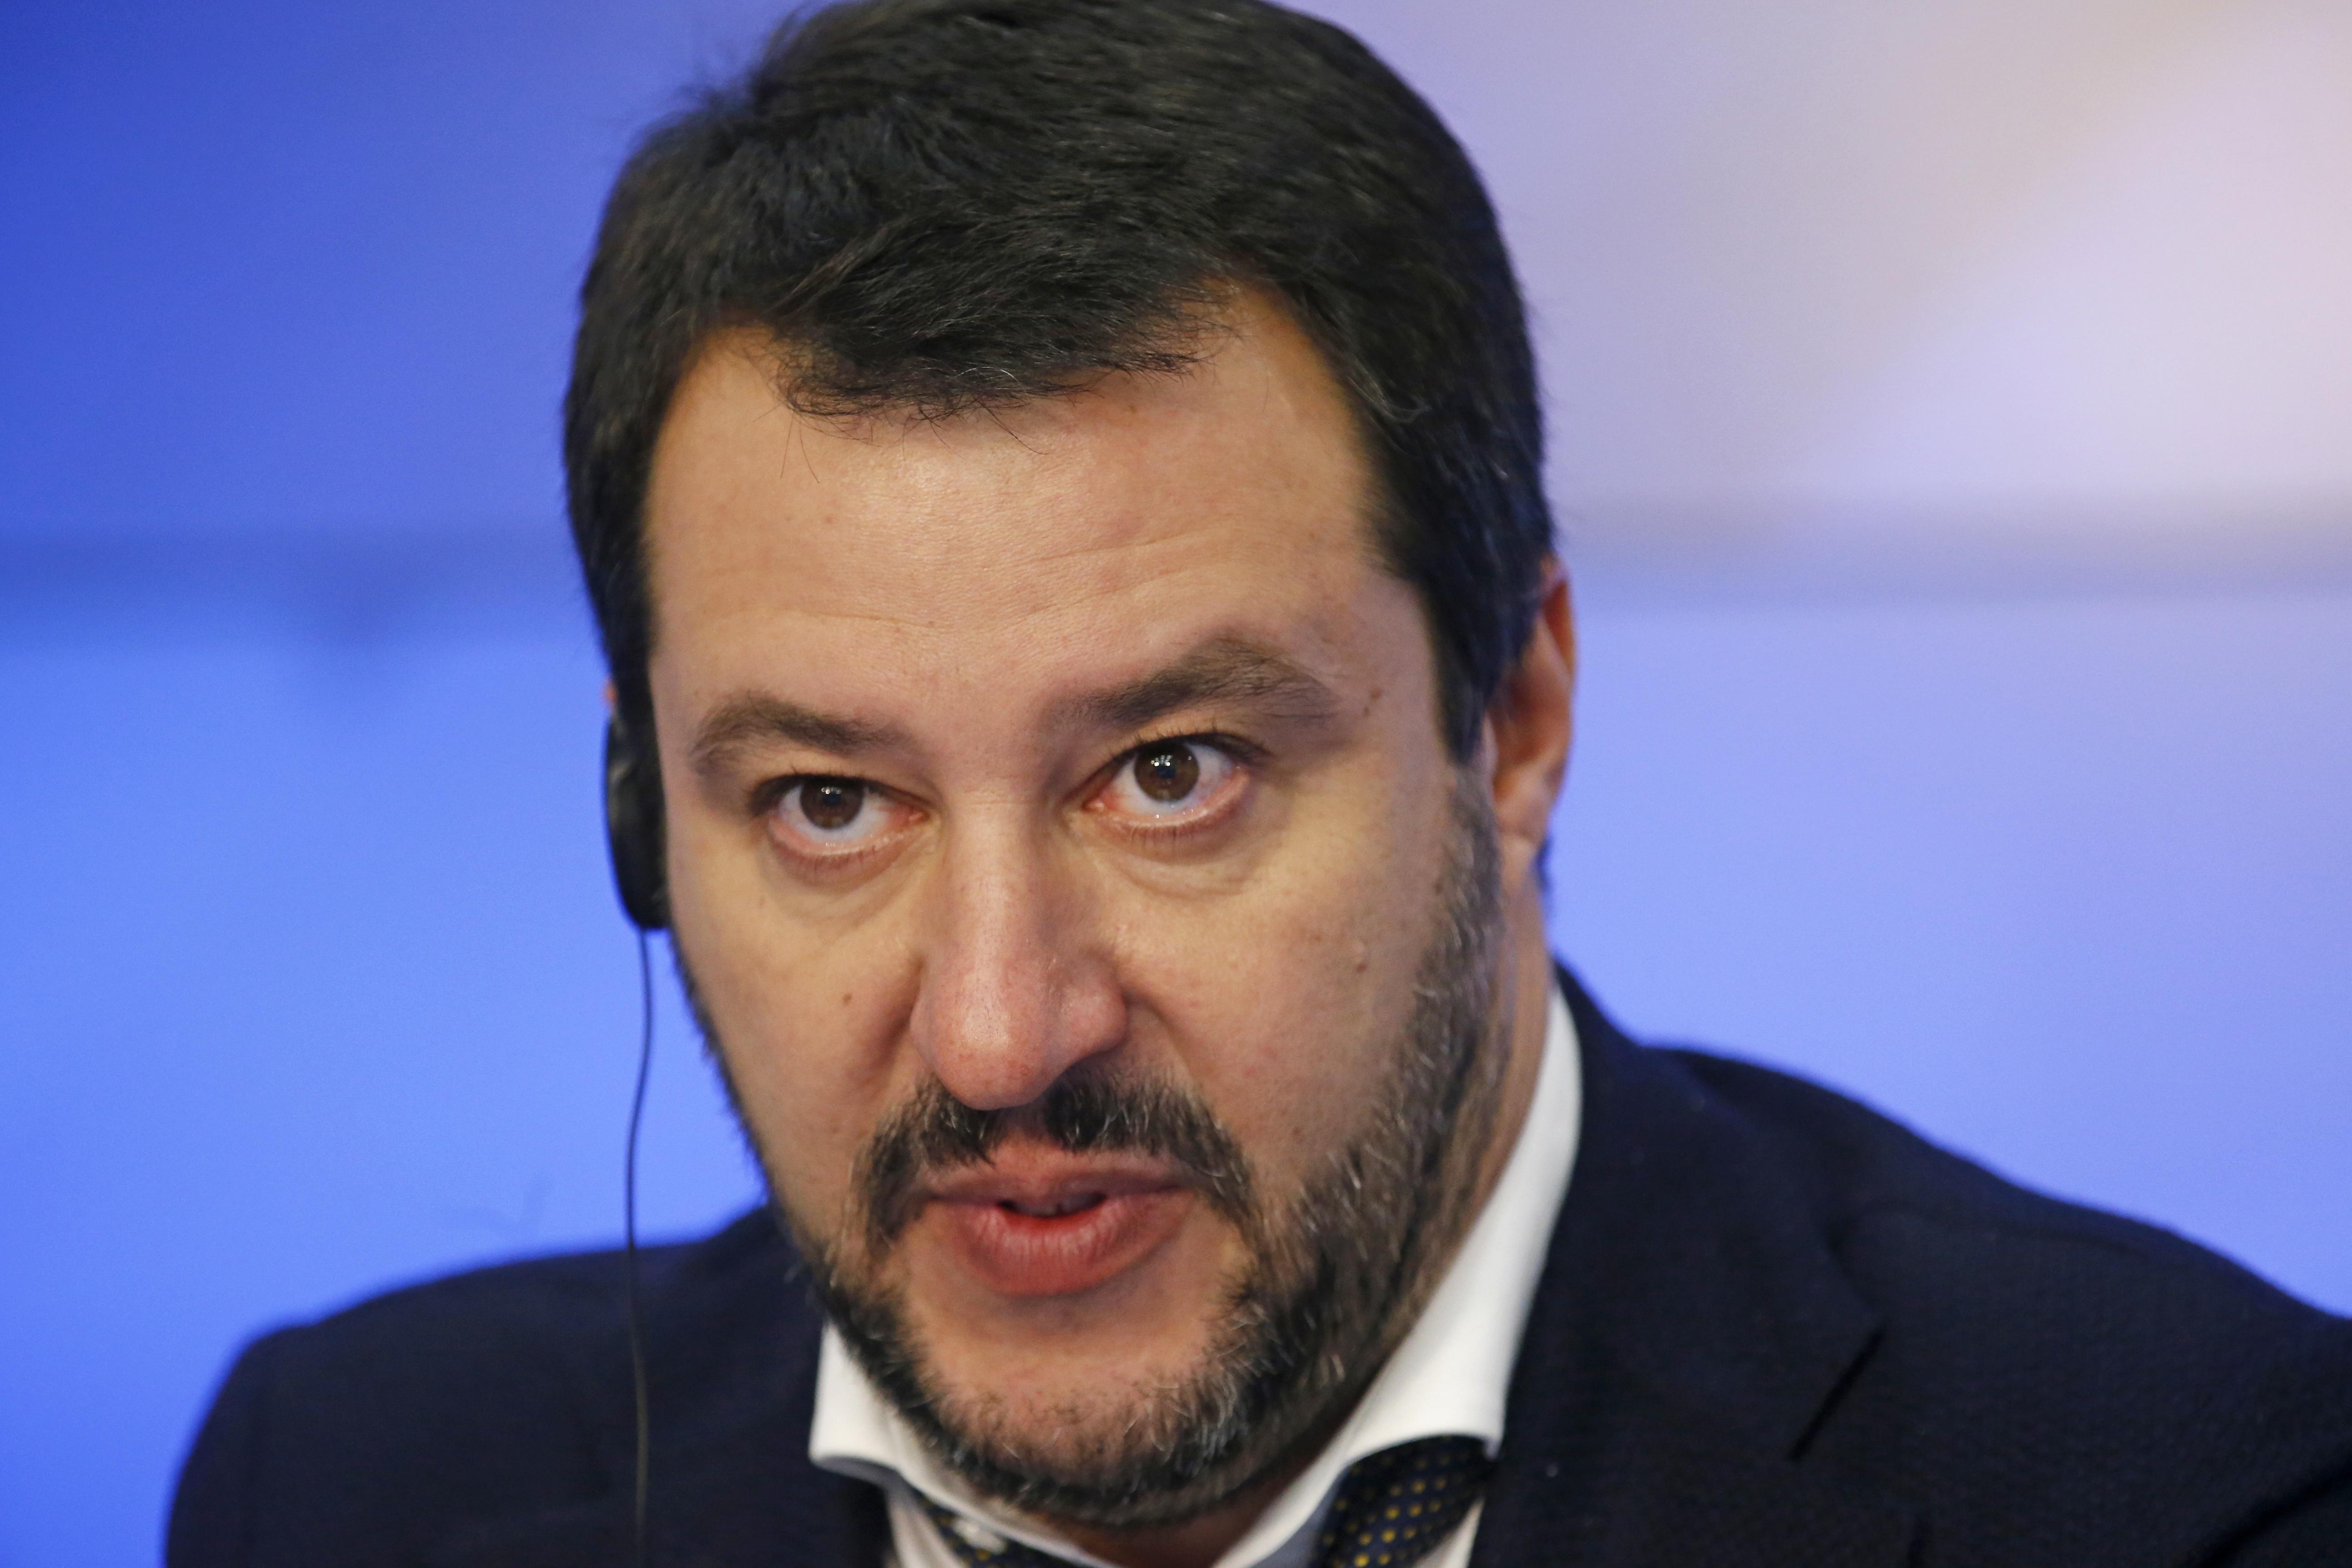 Skinheads Como: Salvini, Pd per migranti